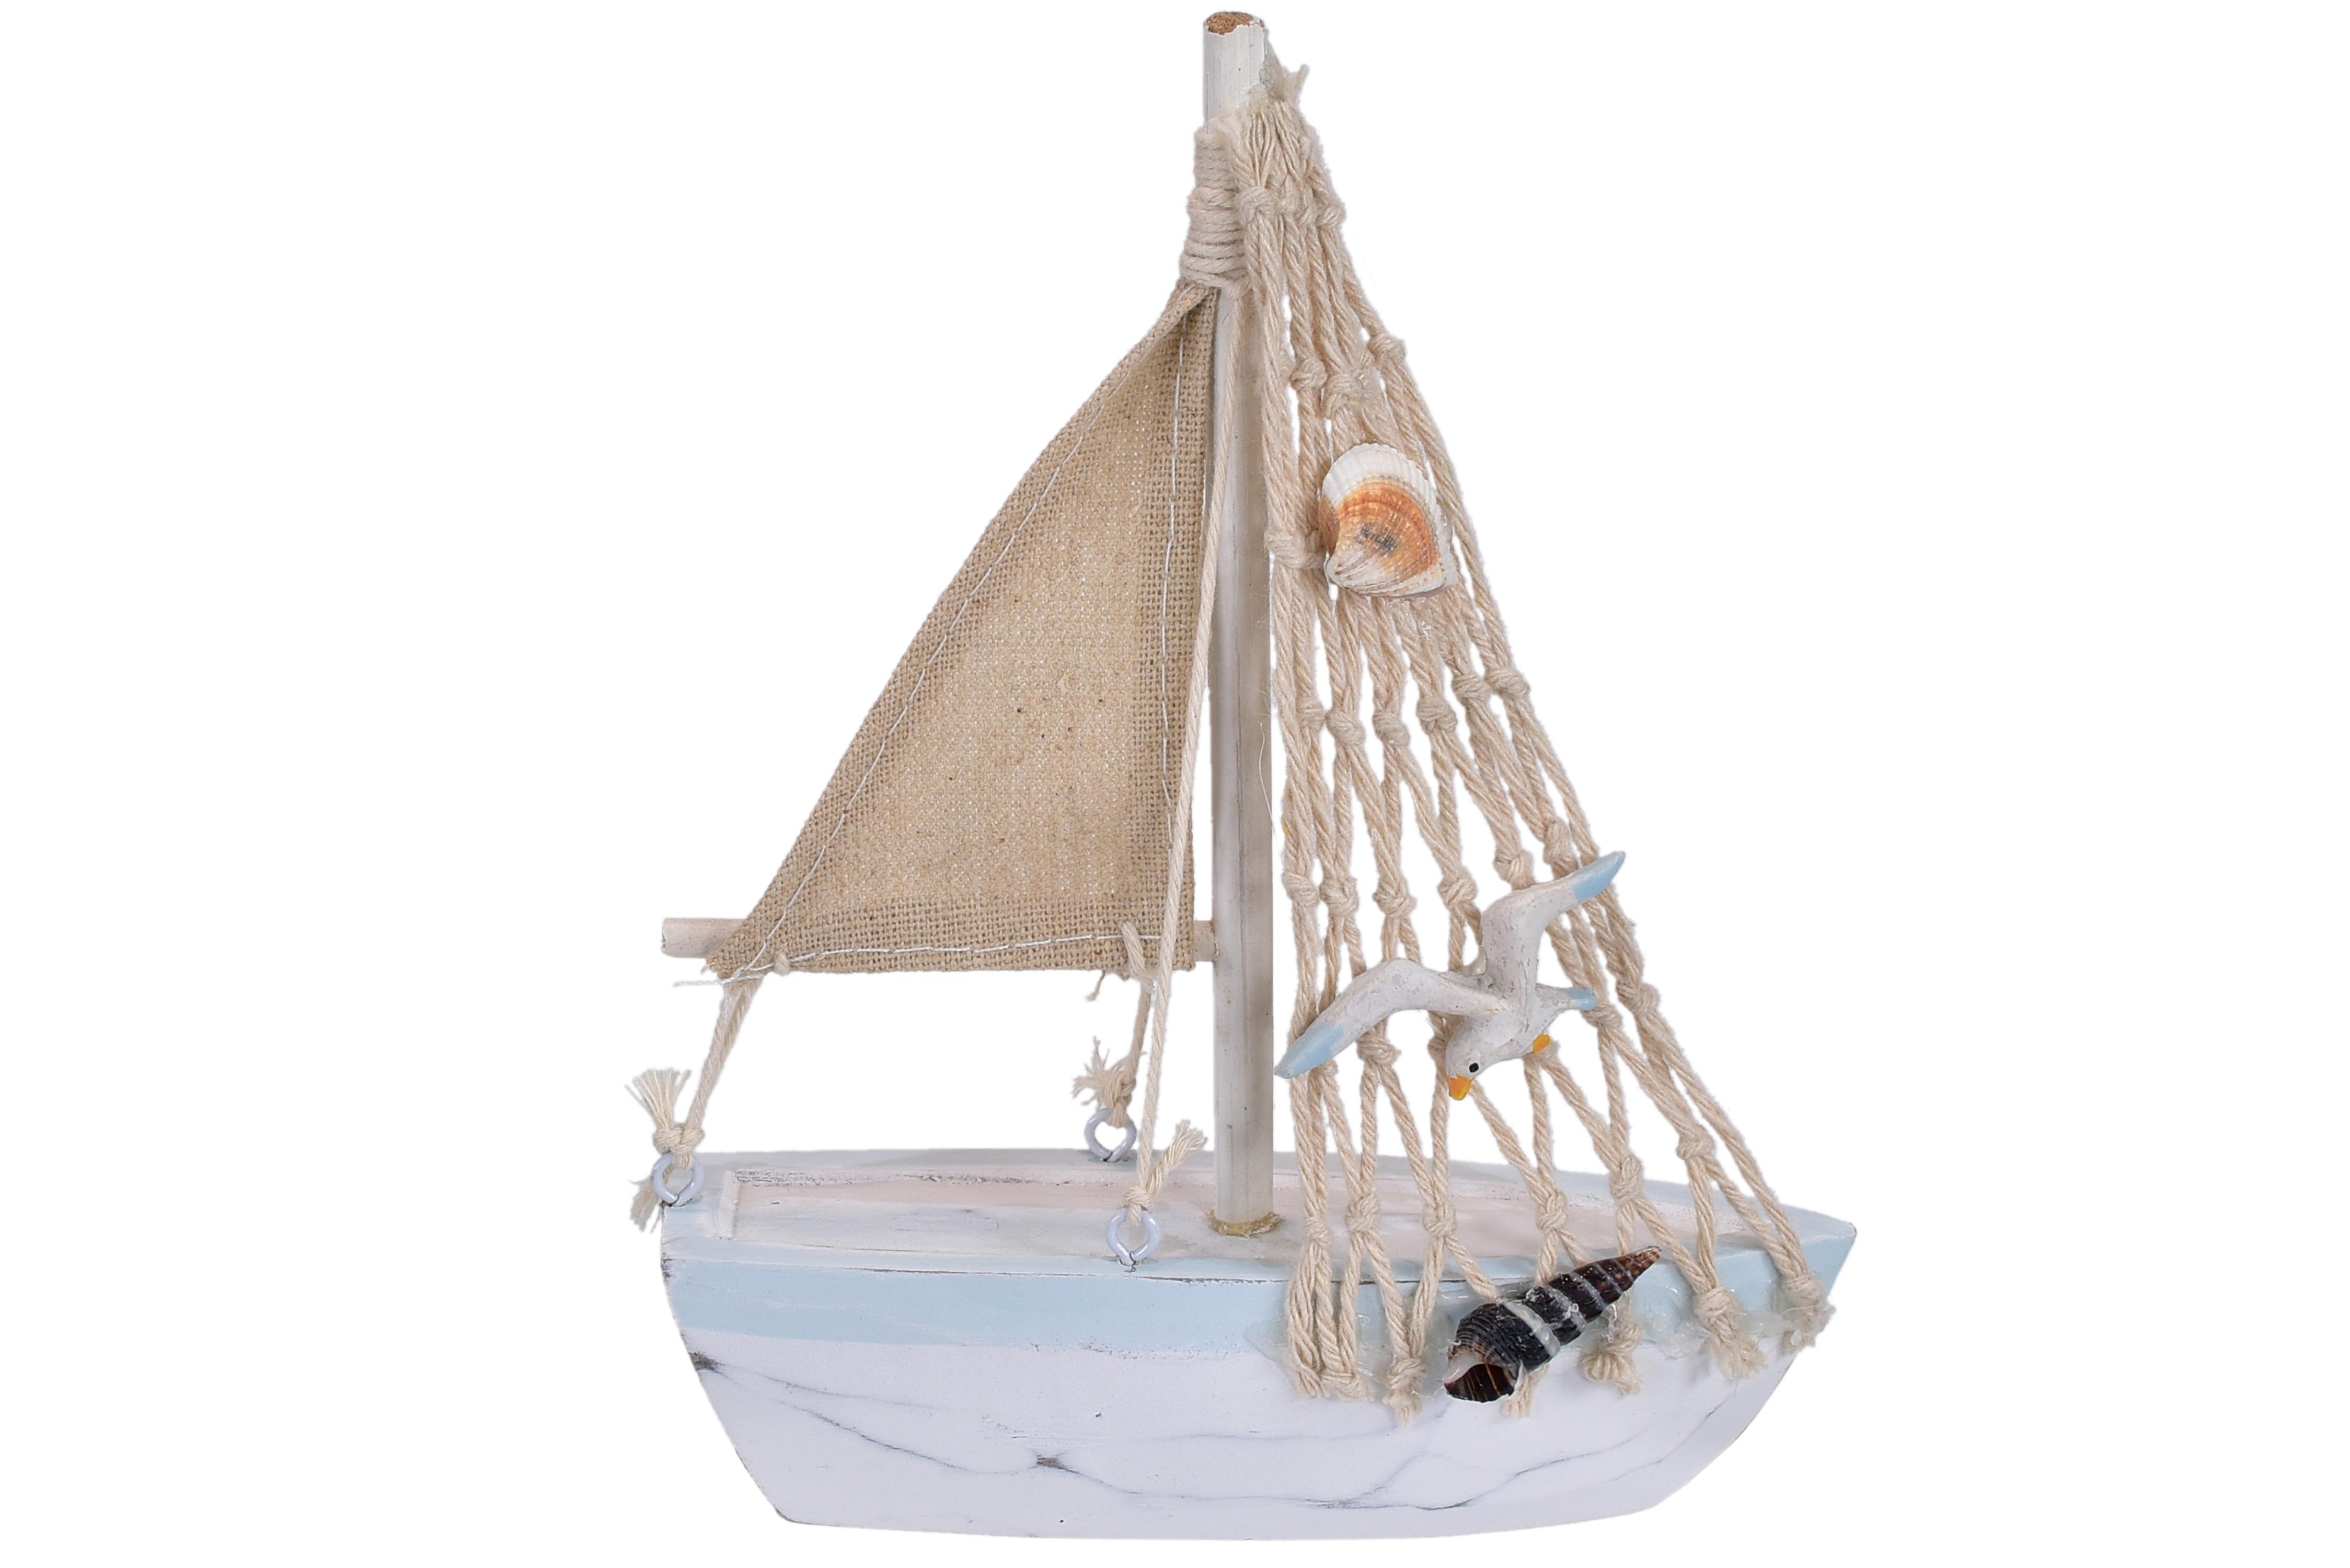 12cm Wooden Fishing Boat